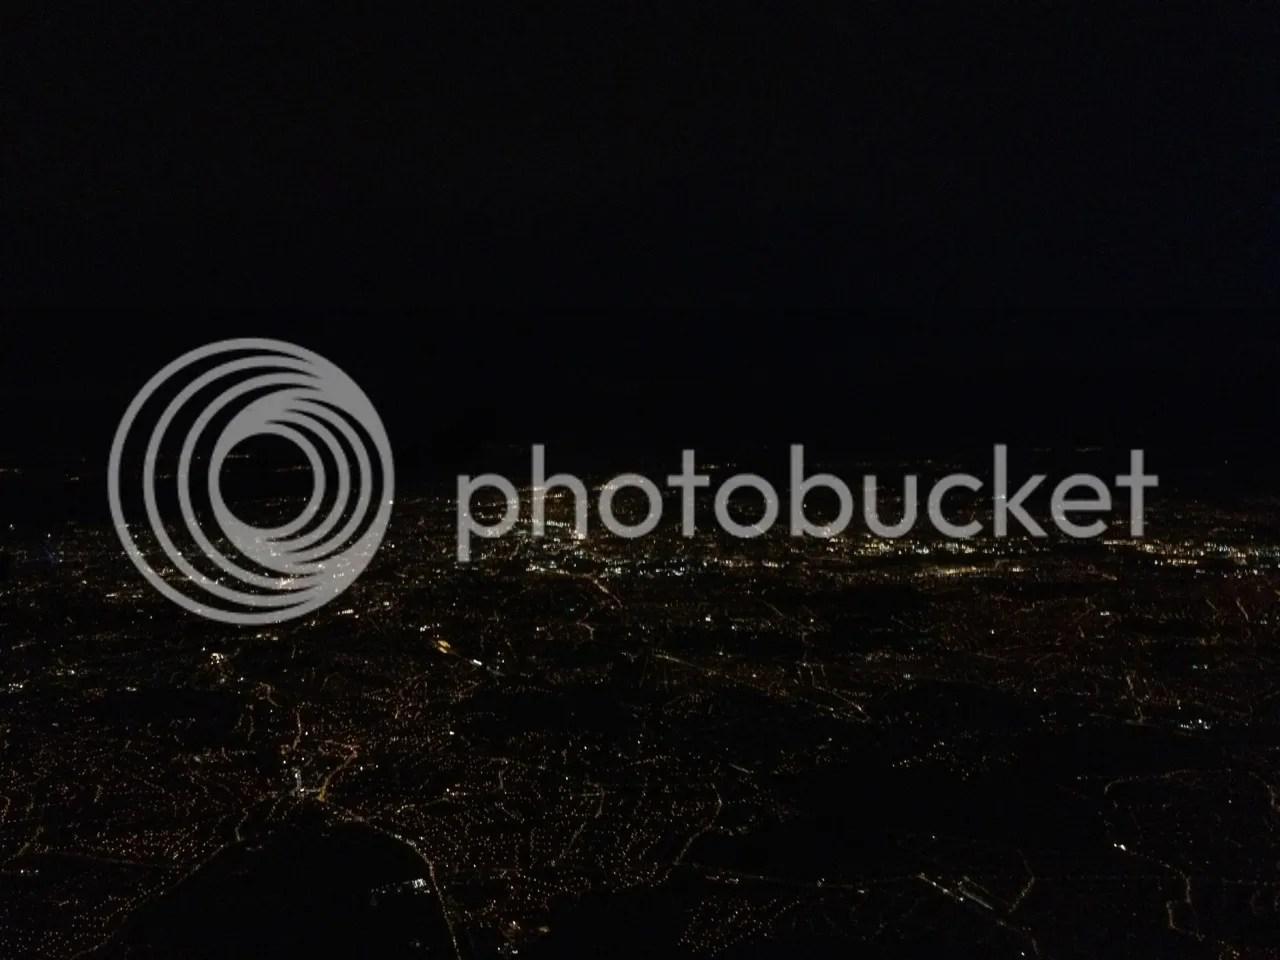 https://i2.wp.com/i181.photobucket.com/albums/x35/jwhite9185/New%20York/file_zps929f718f.jpg